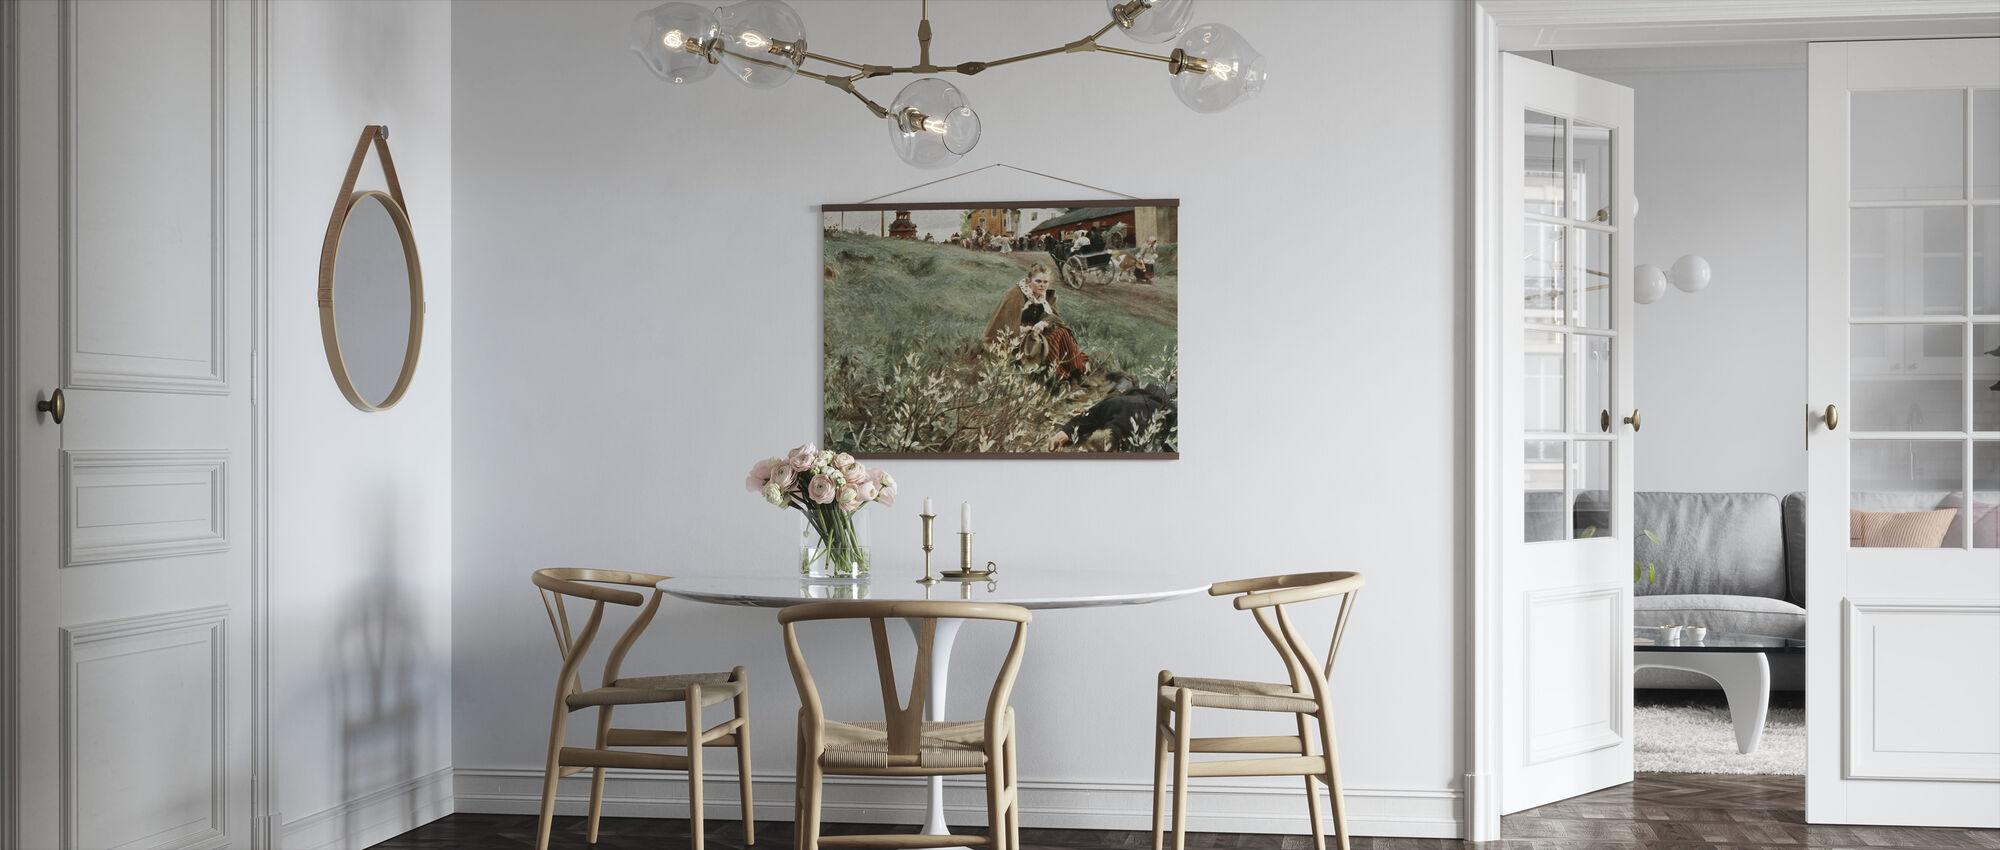 Anders Zorn - Julstamning - Plakat - Kjøkken